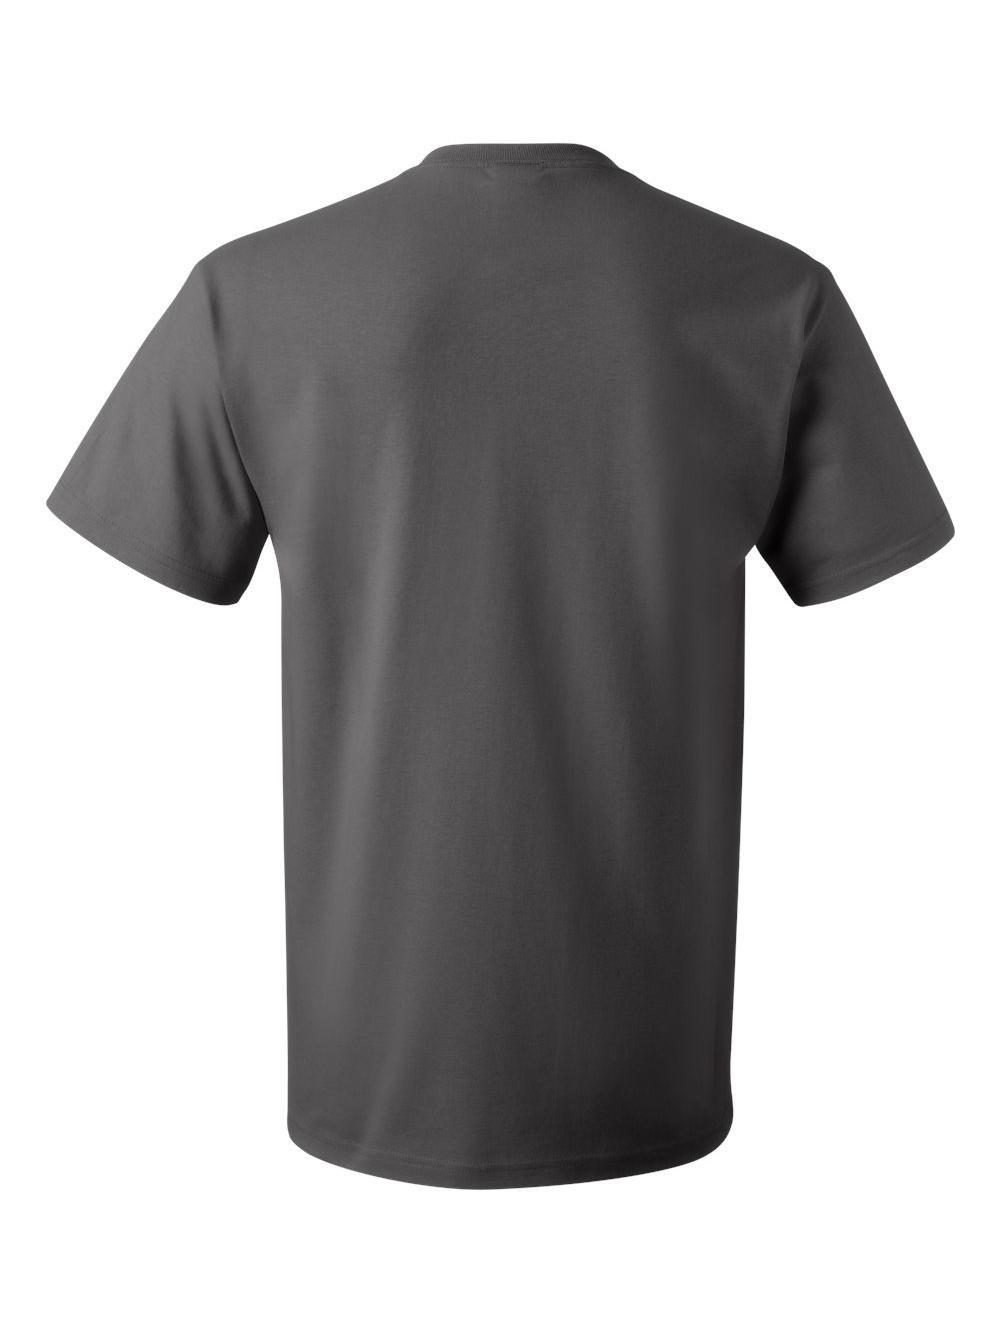 Fruit-of-the-Loom-HD-Cotton-Short-Sleeve-T-Shirt-3930R thumbnail 25